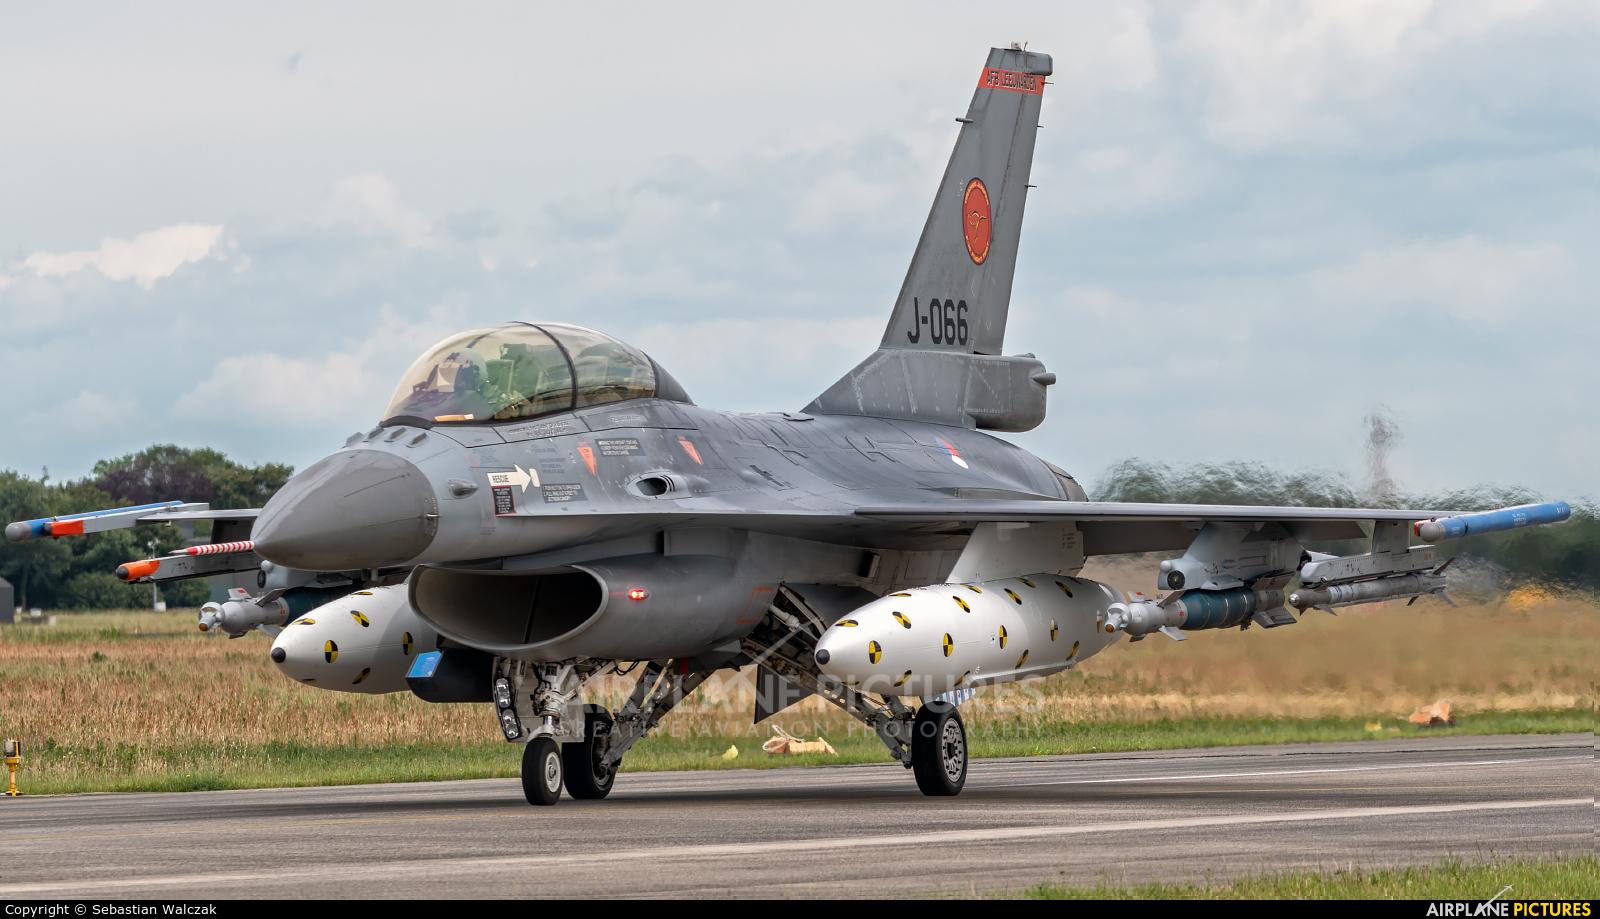 Netherlands - Air Force J-066 aircraft at Uden - Volkel